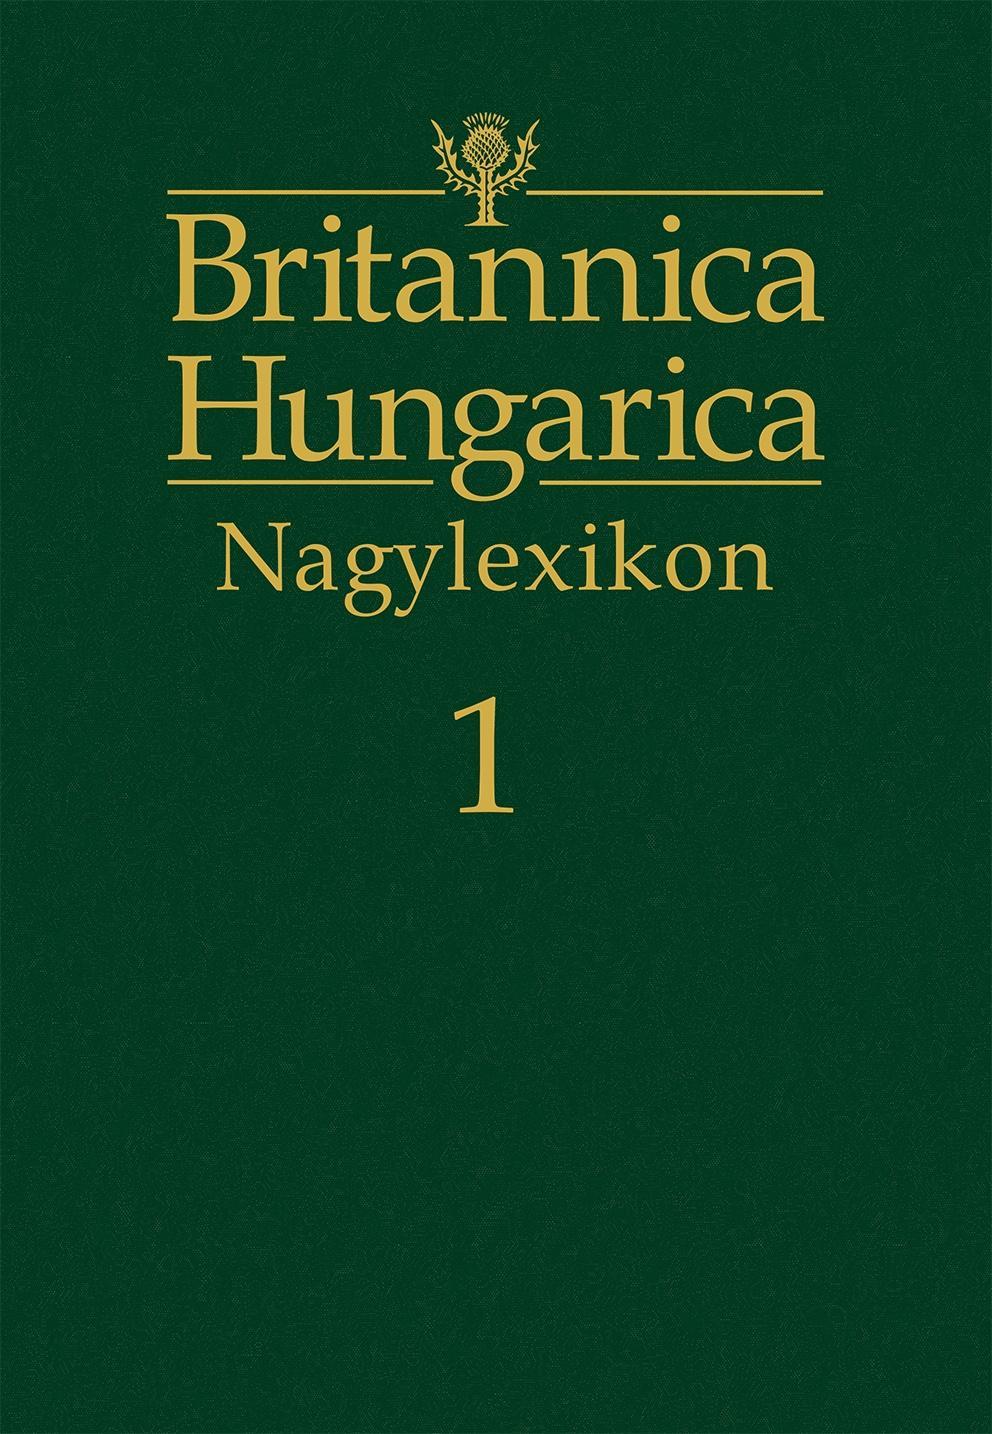 - BRITANNICA HUNGARICA NAGYLEXIKON - 1.